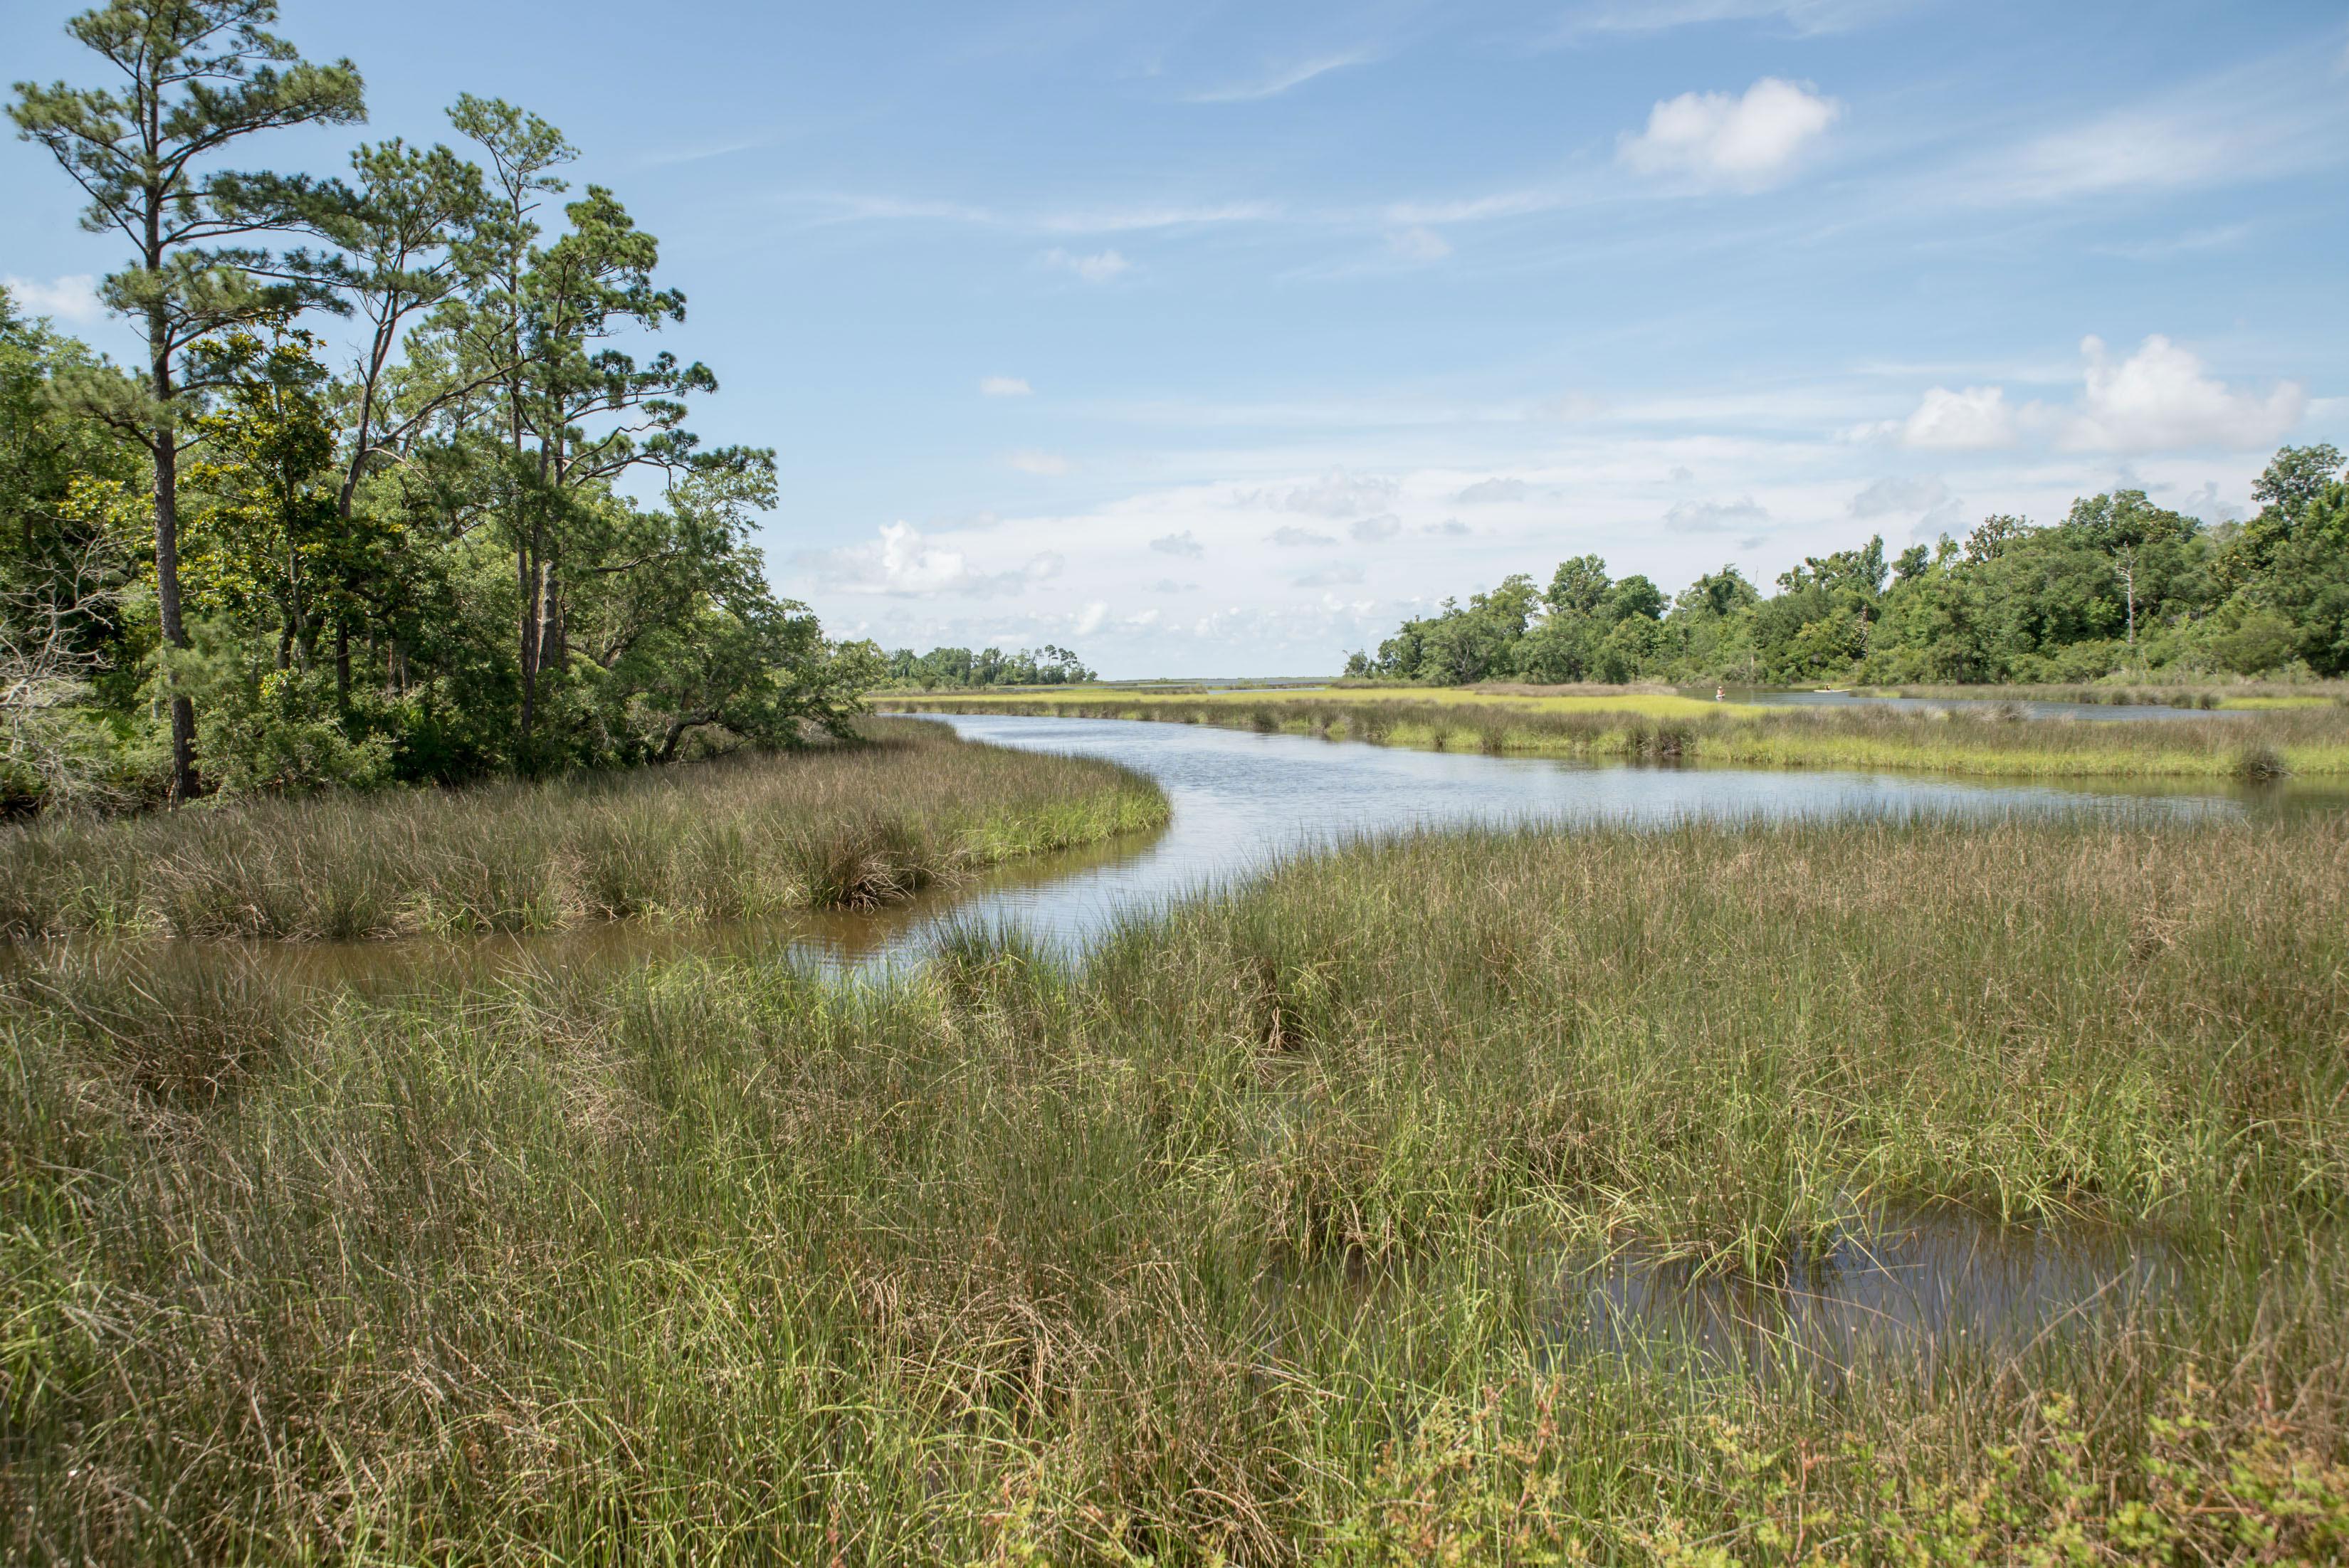 Davis Bayou Blueway